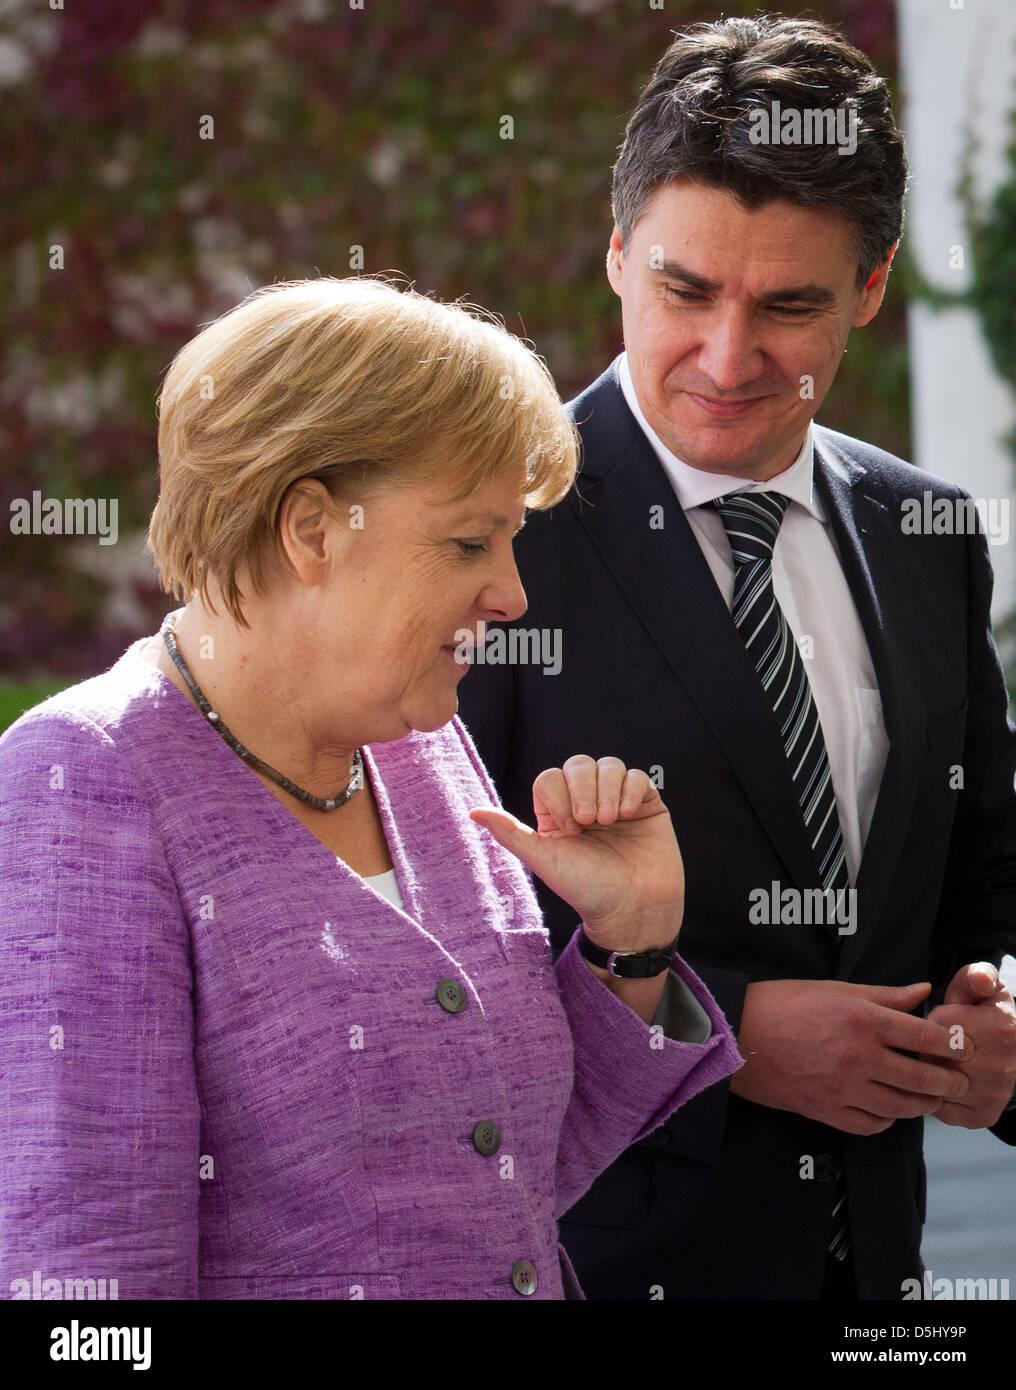 German Chancellor Angela Merkel (CDU) welcomes Croatian Prime Minister Zoran Milanovic at the Federal Chancellery - Stock Image